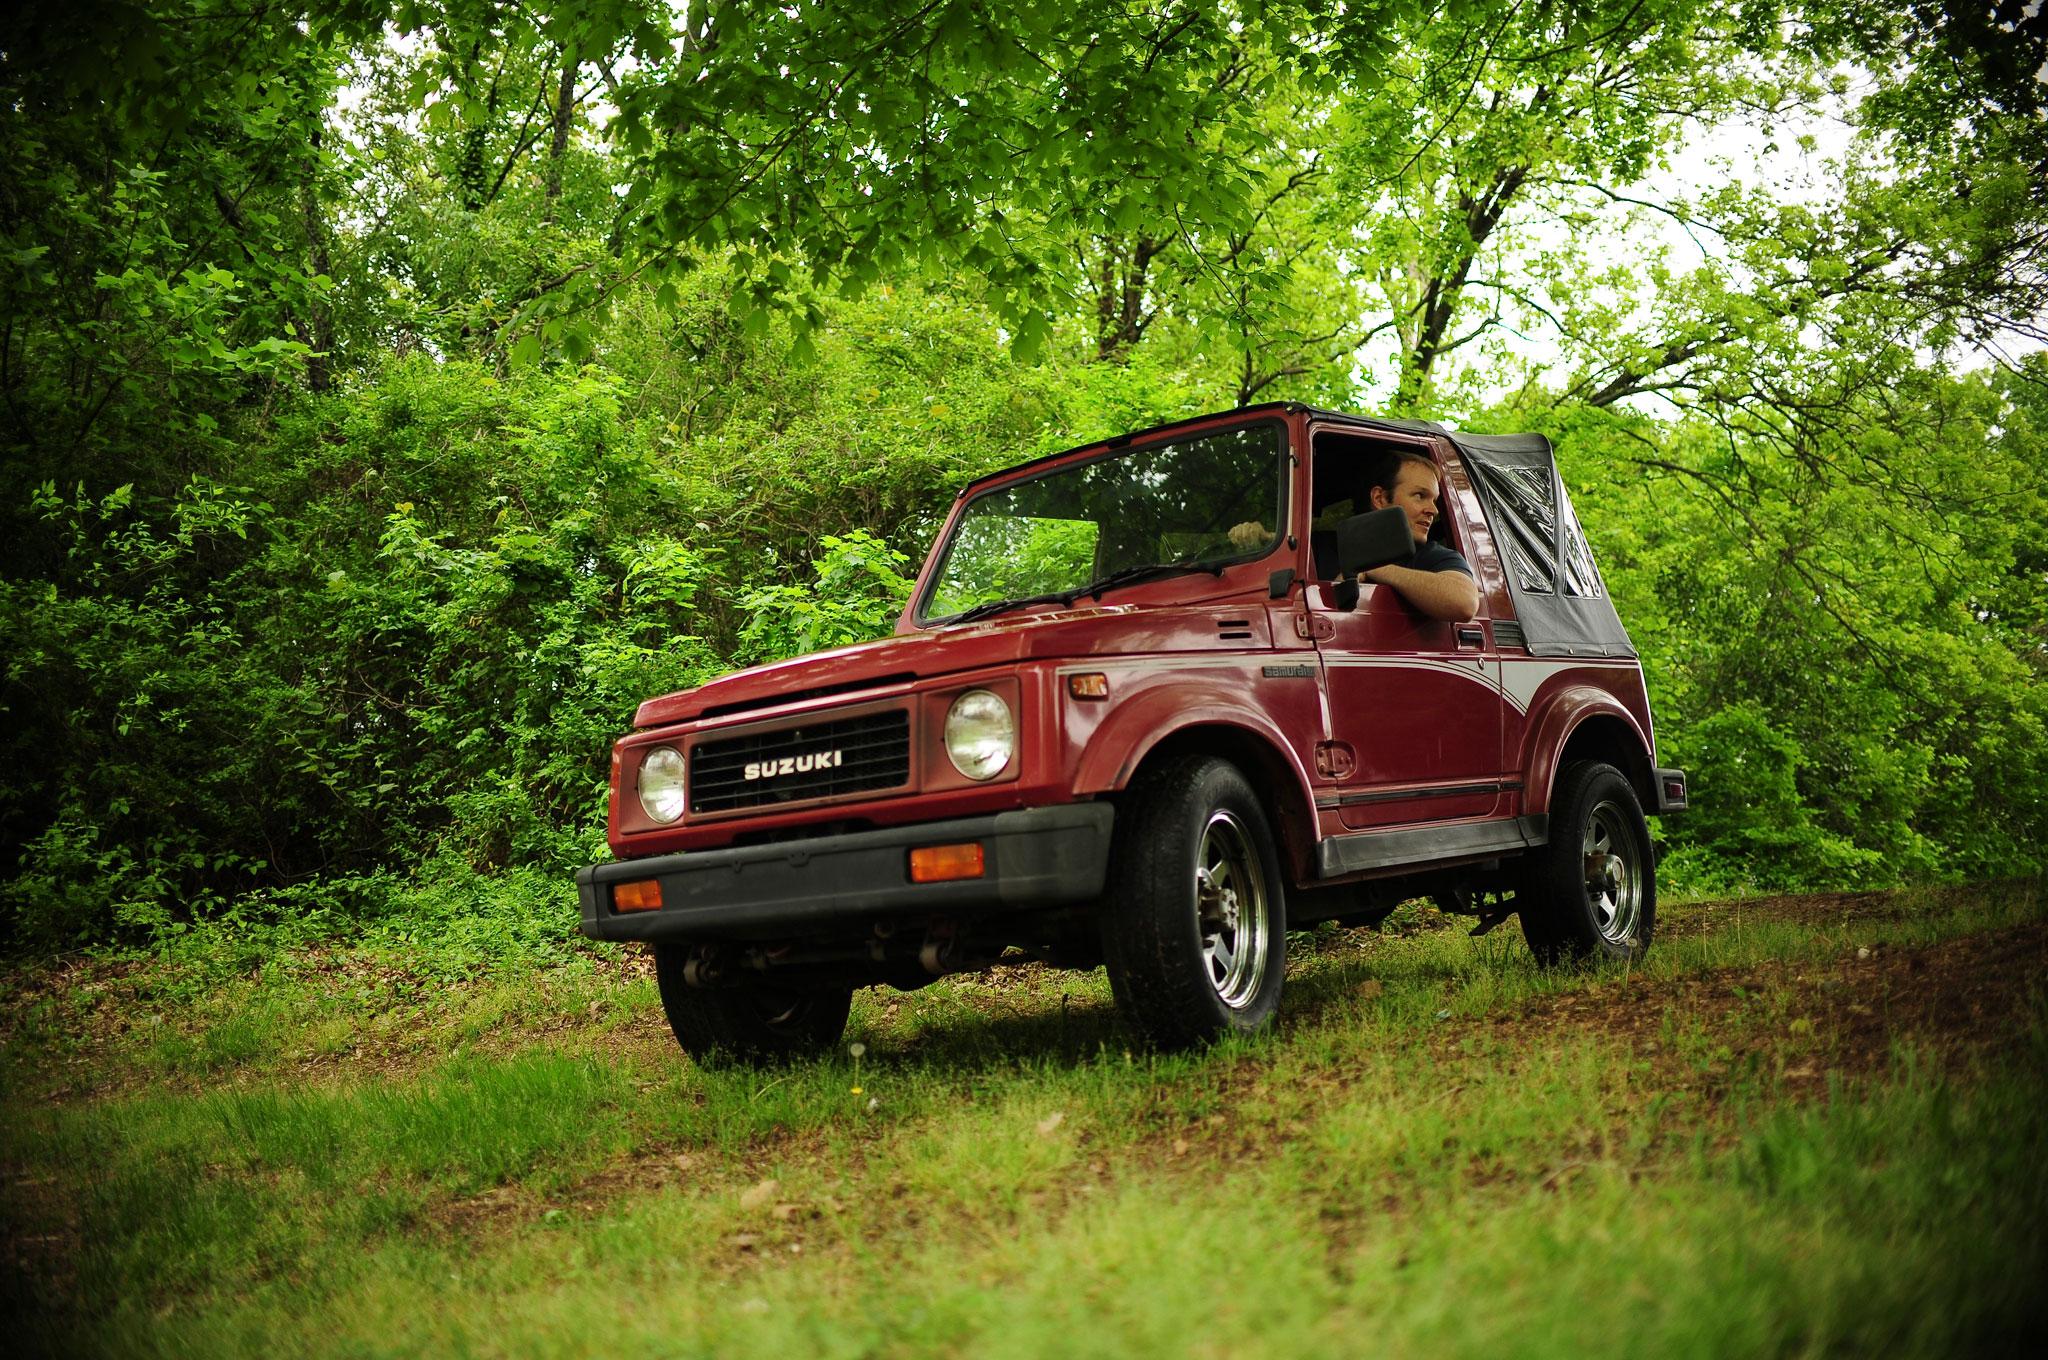 Suzuki Samurai: all the fun about a compact Japanese SUV